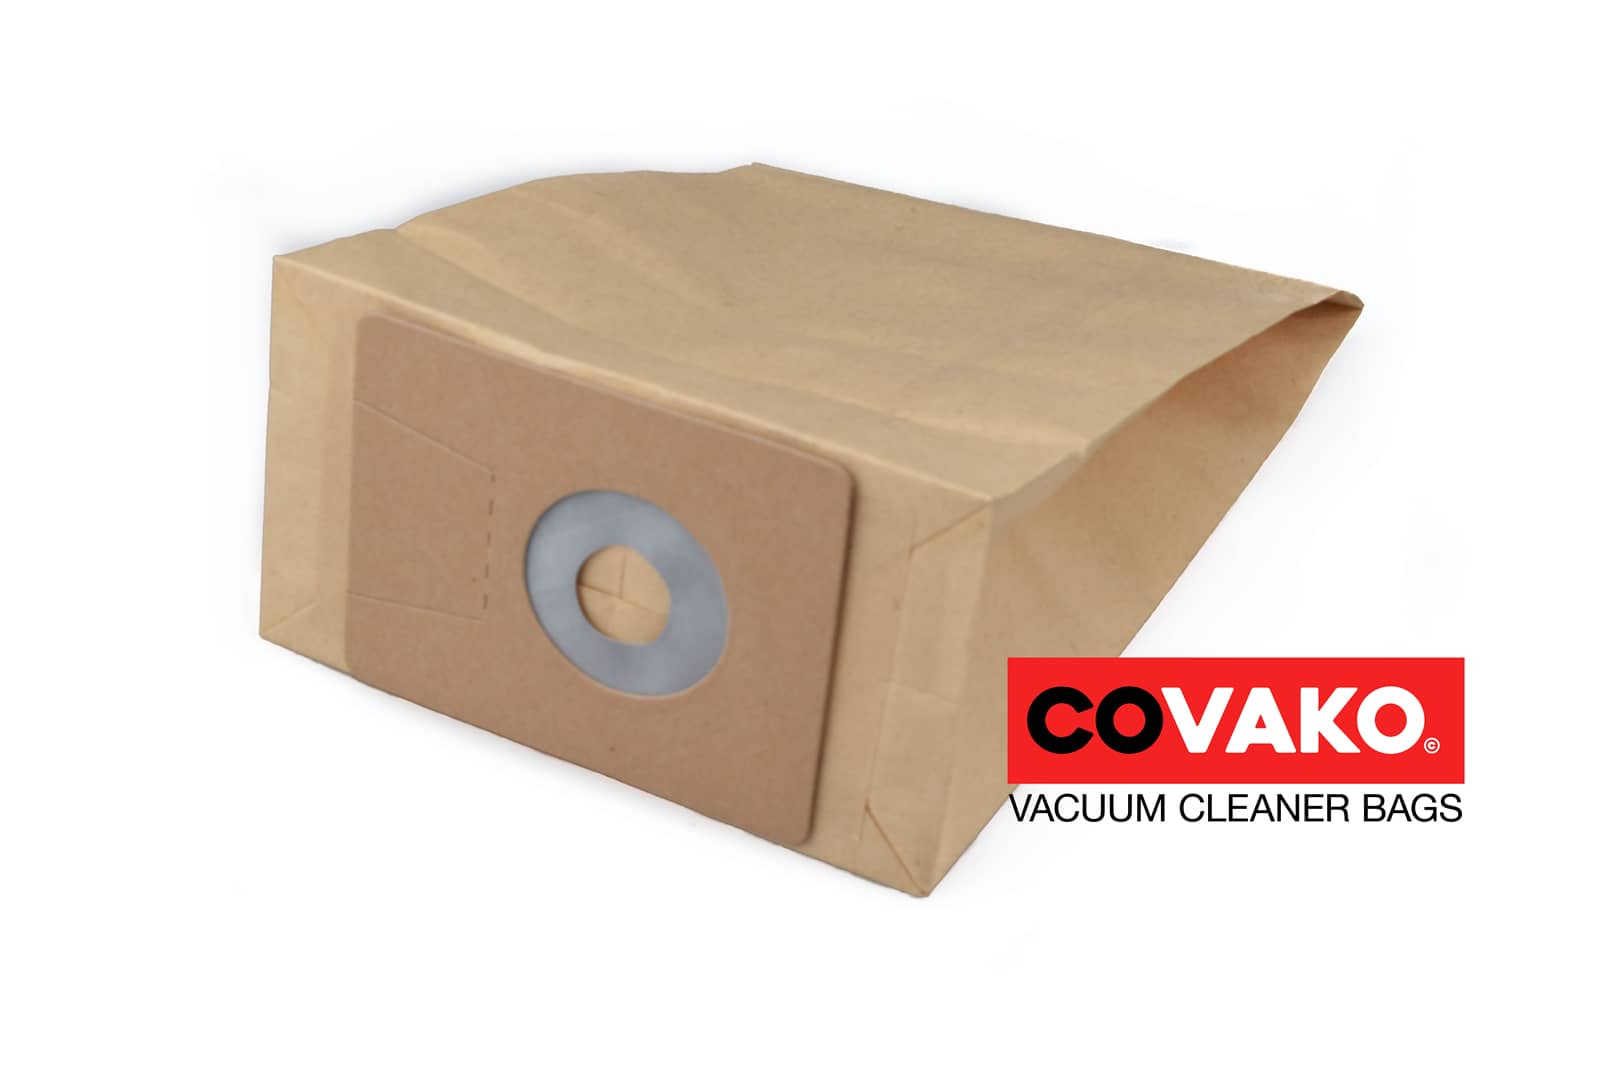 Soteco Top 1 / Paper - Soteco vacuum cleaner bags